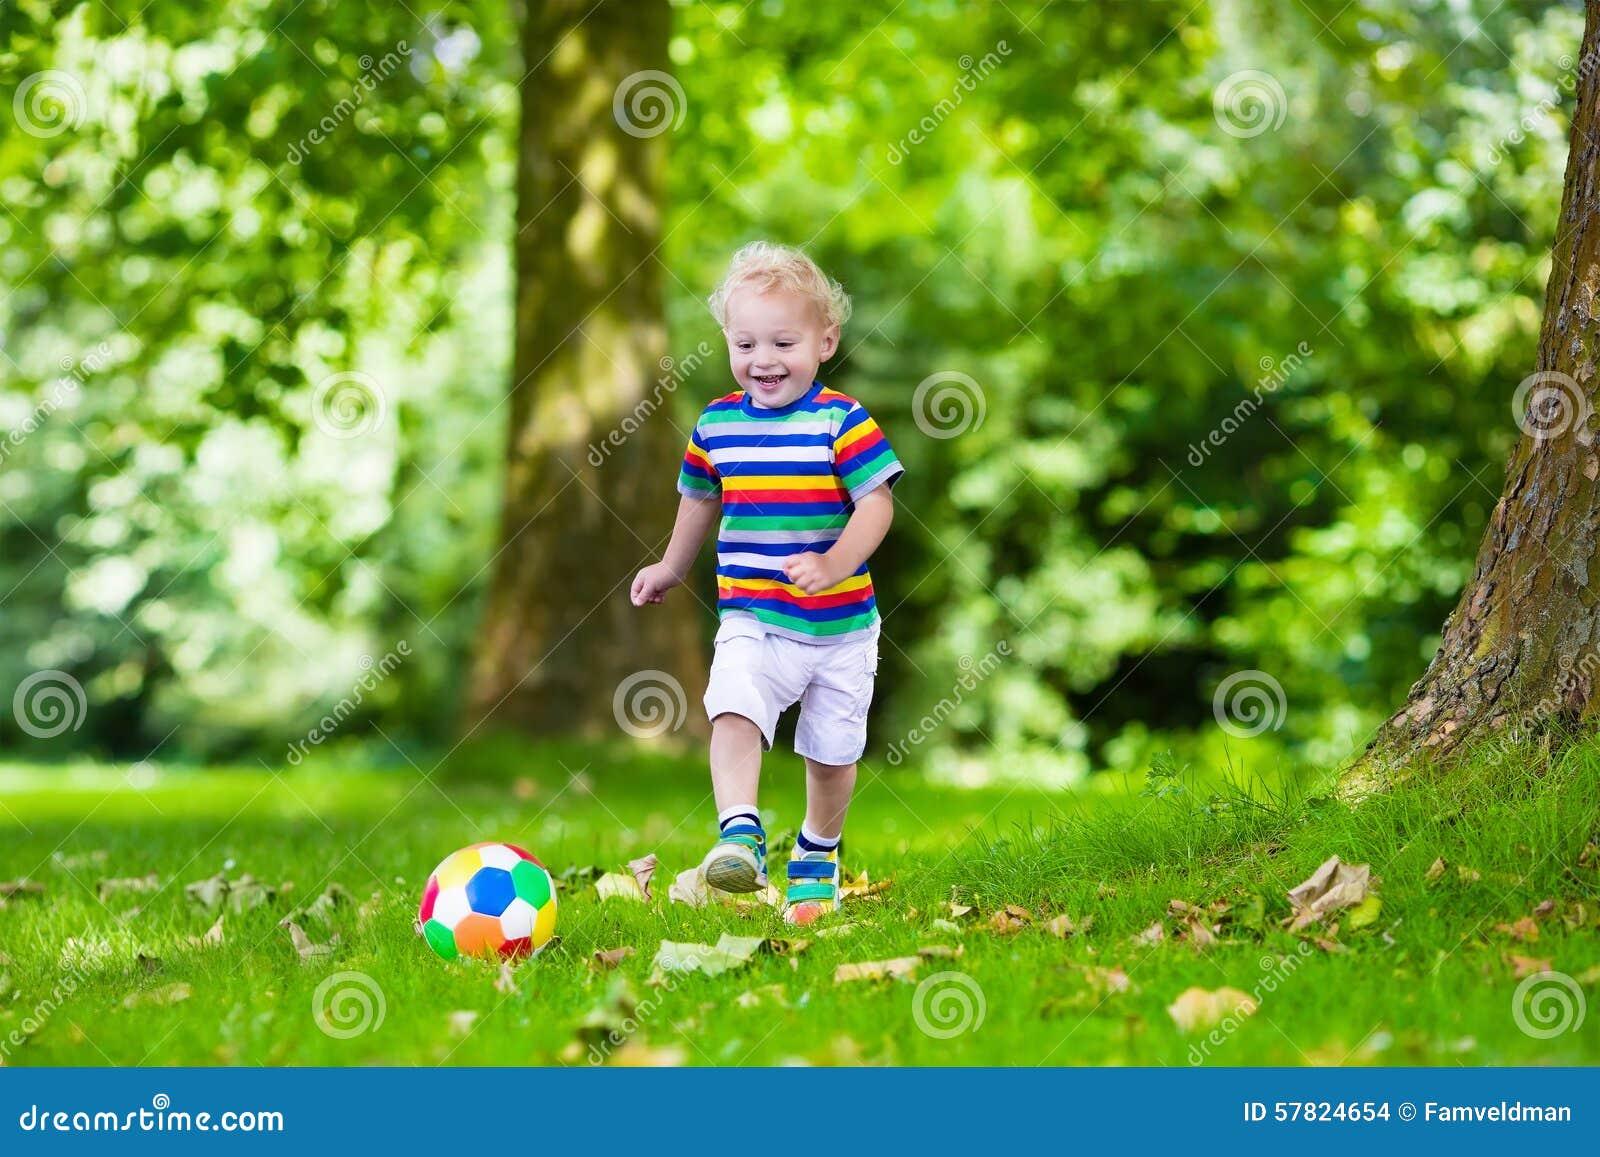 sport football happy kids play better